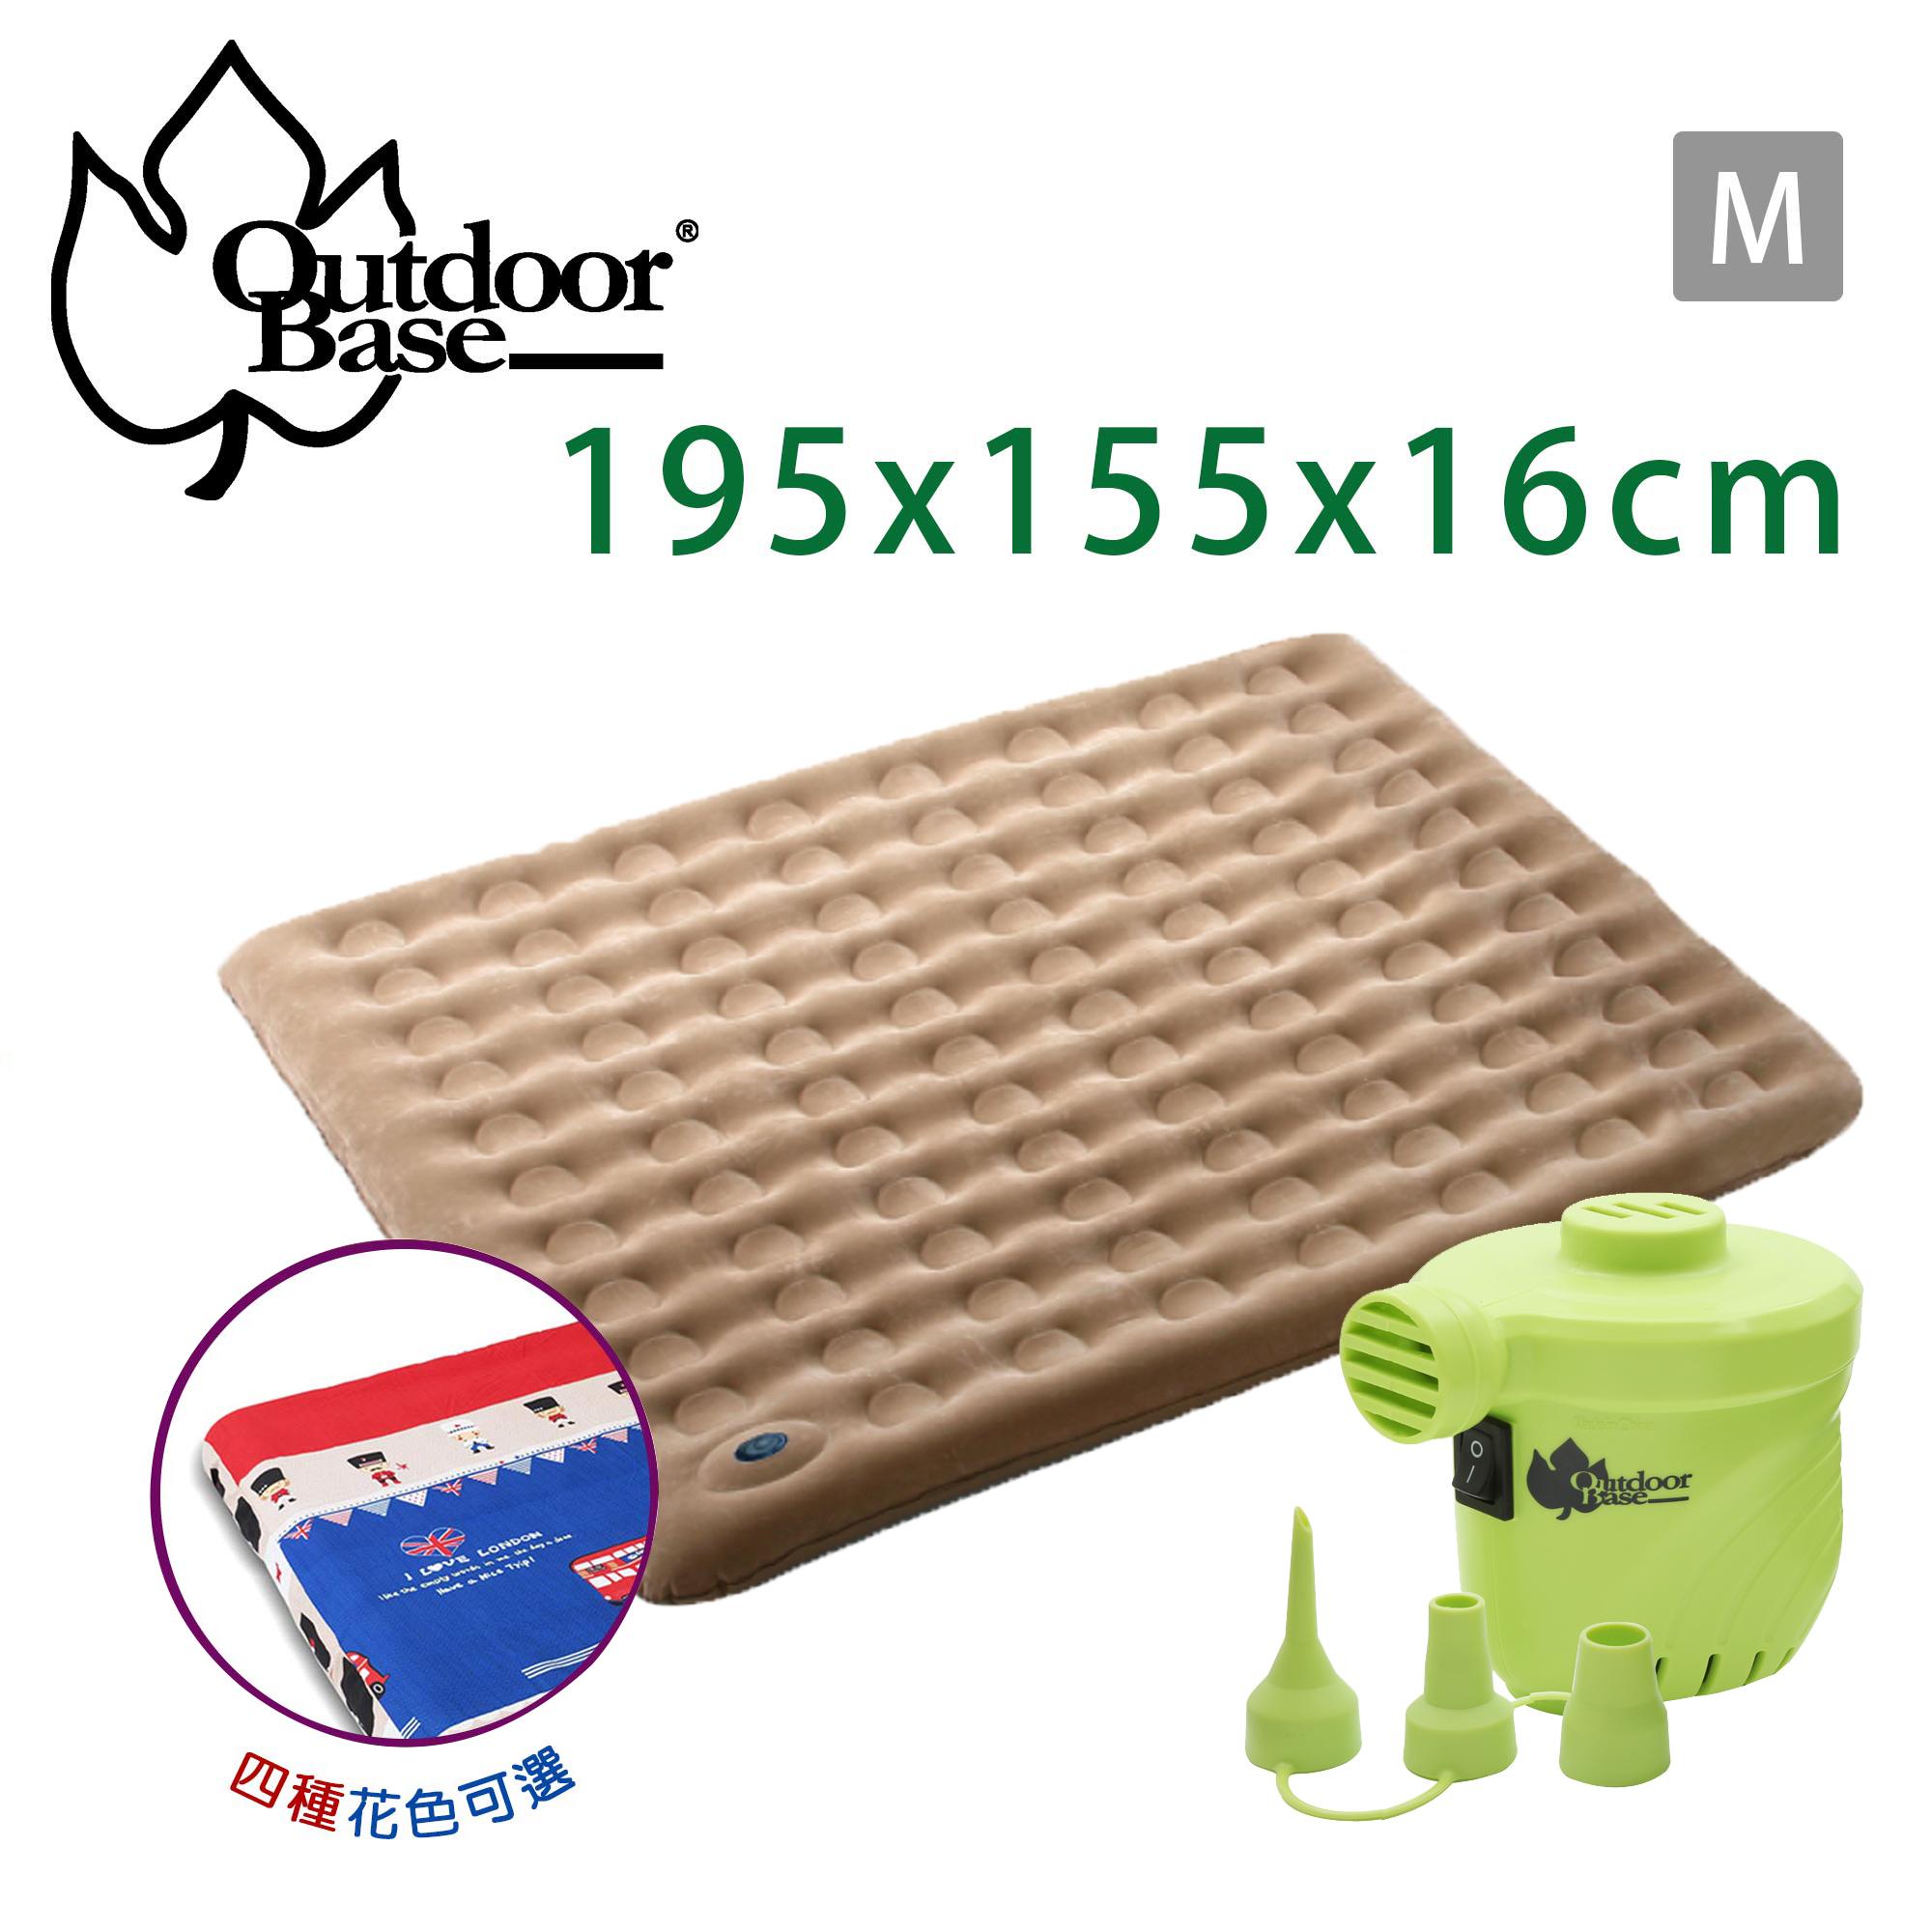 outdoorbase 歡樂時光充氣床M(吸抽兩用幫浦+床包) 充氣床墊